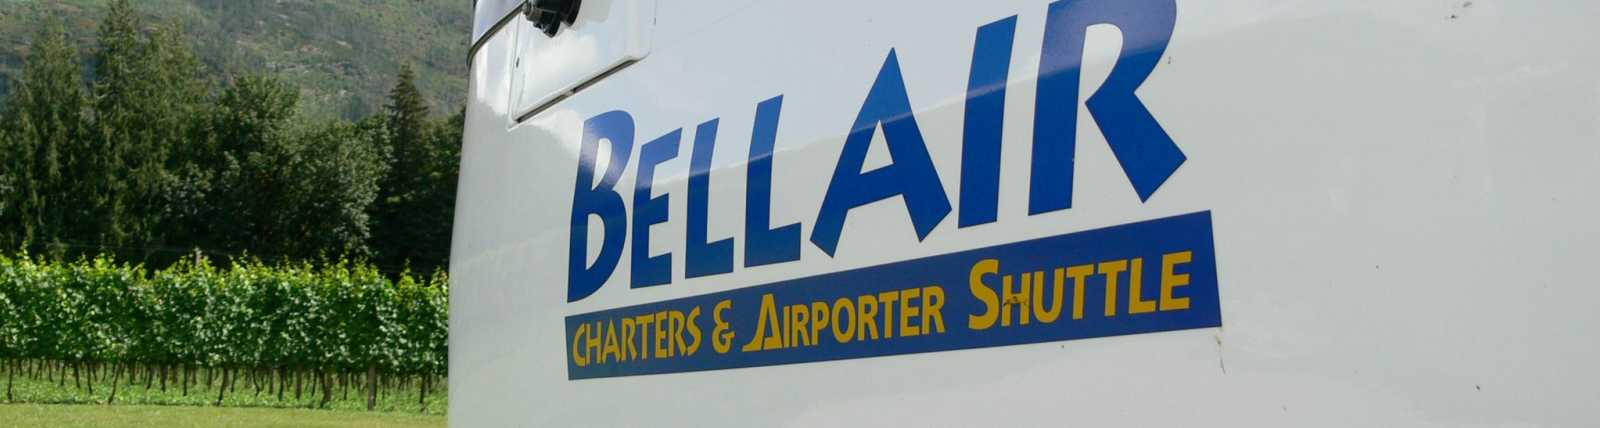 Bellair Charters/Airporter Shuttle